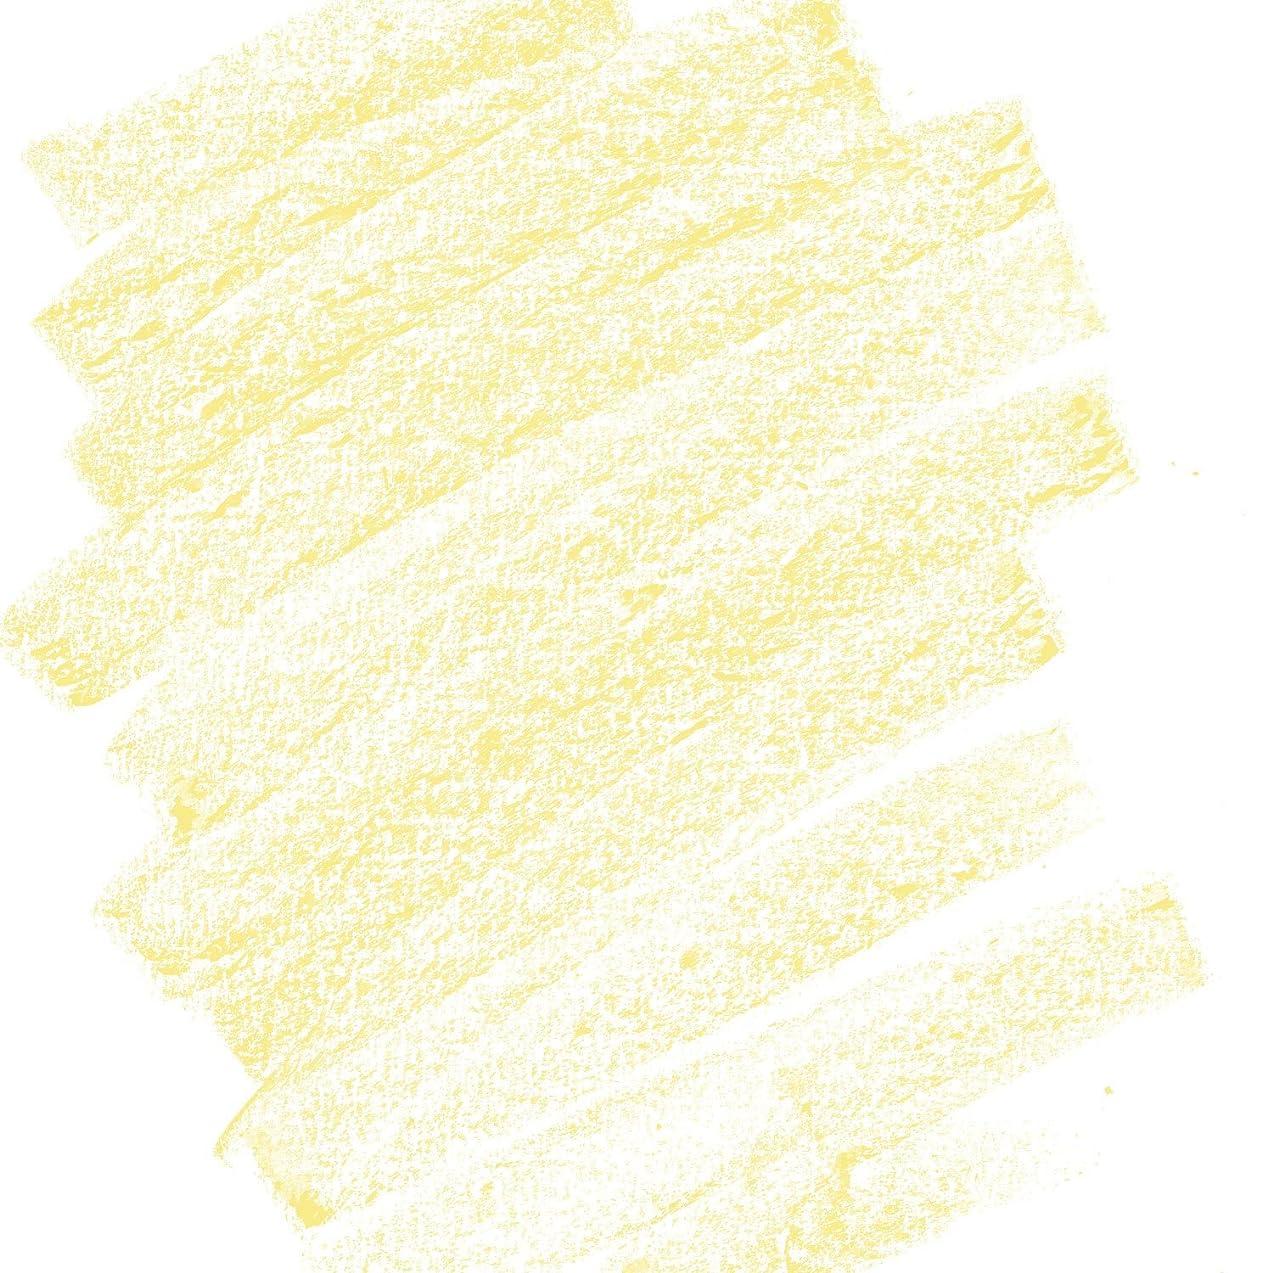 Chartpak 17009079 Pastels O, Vanadium Yellow Deep